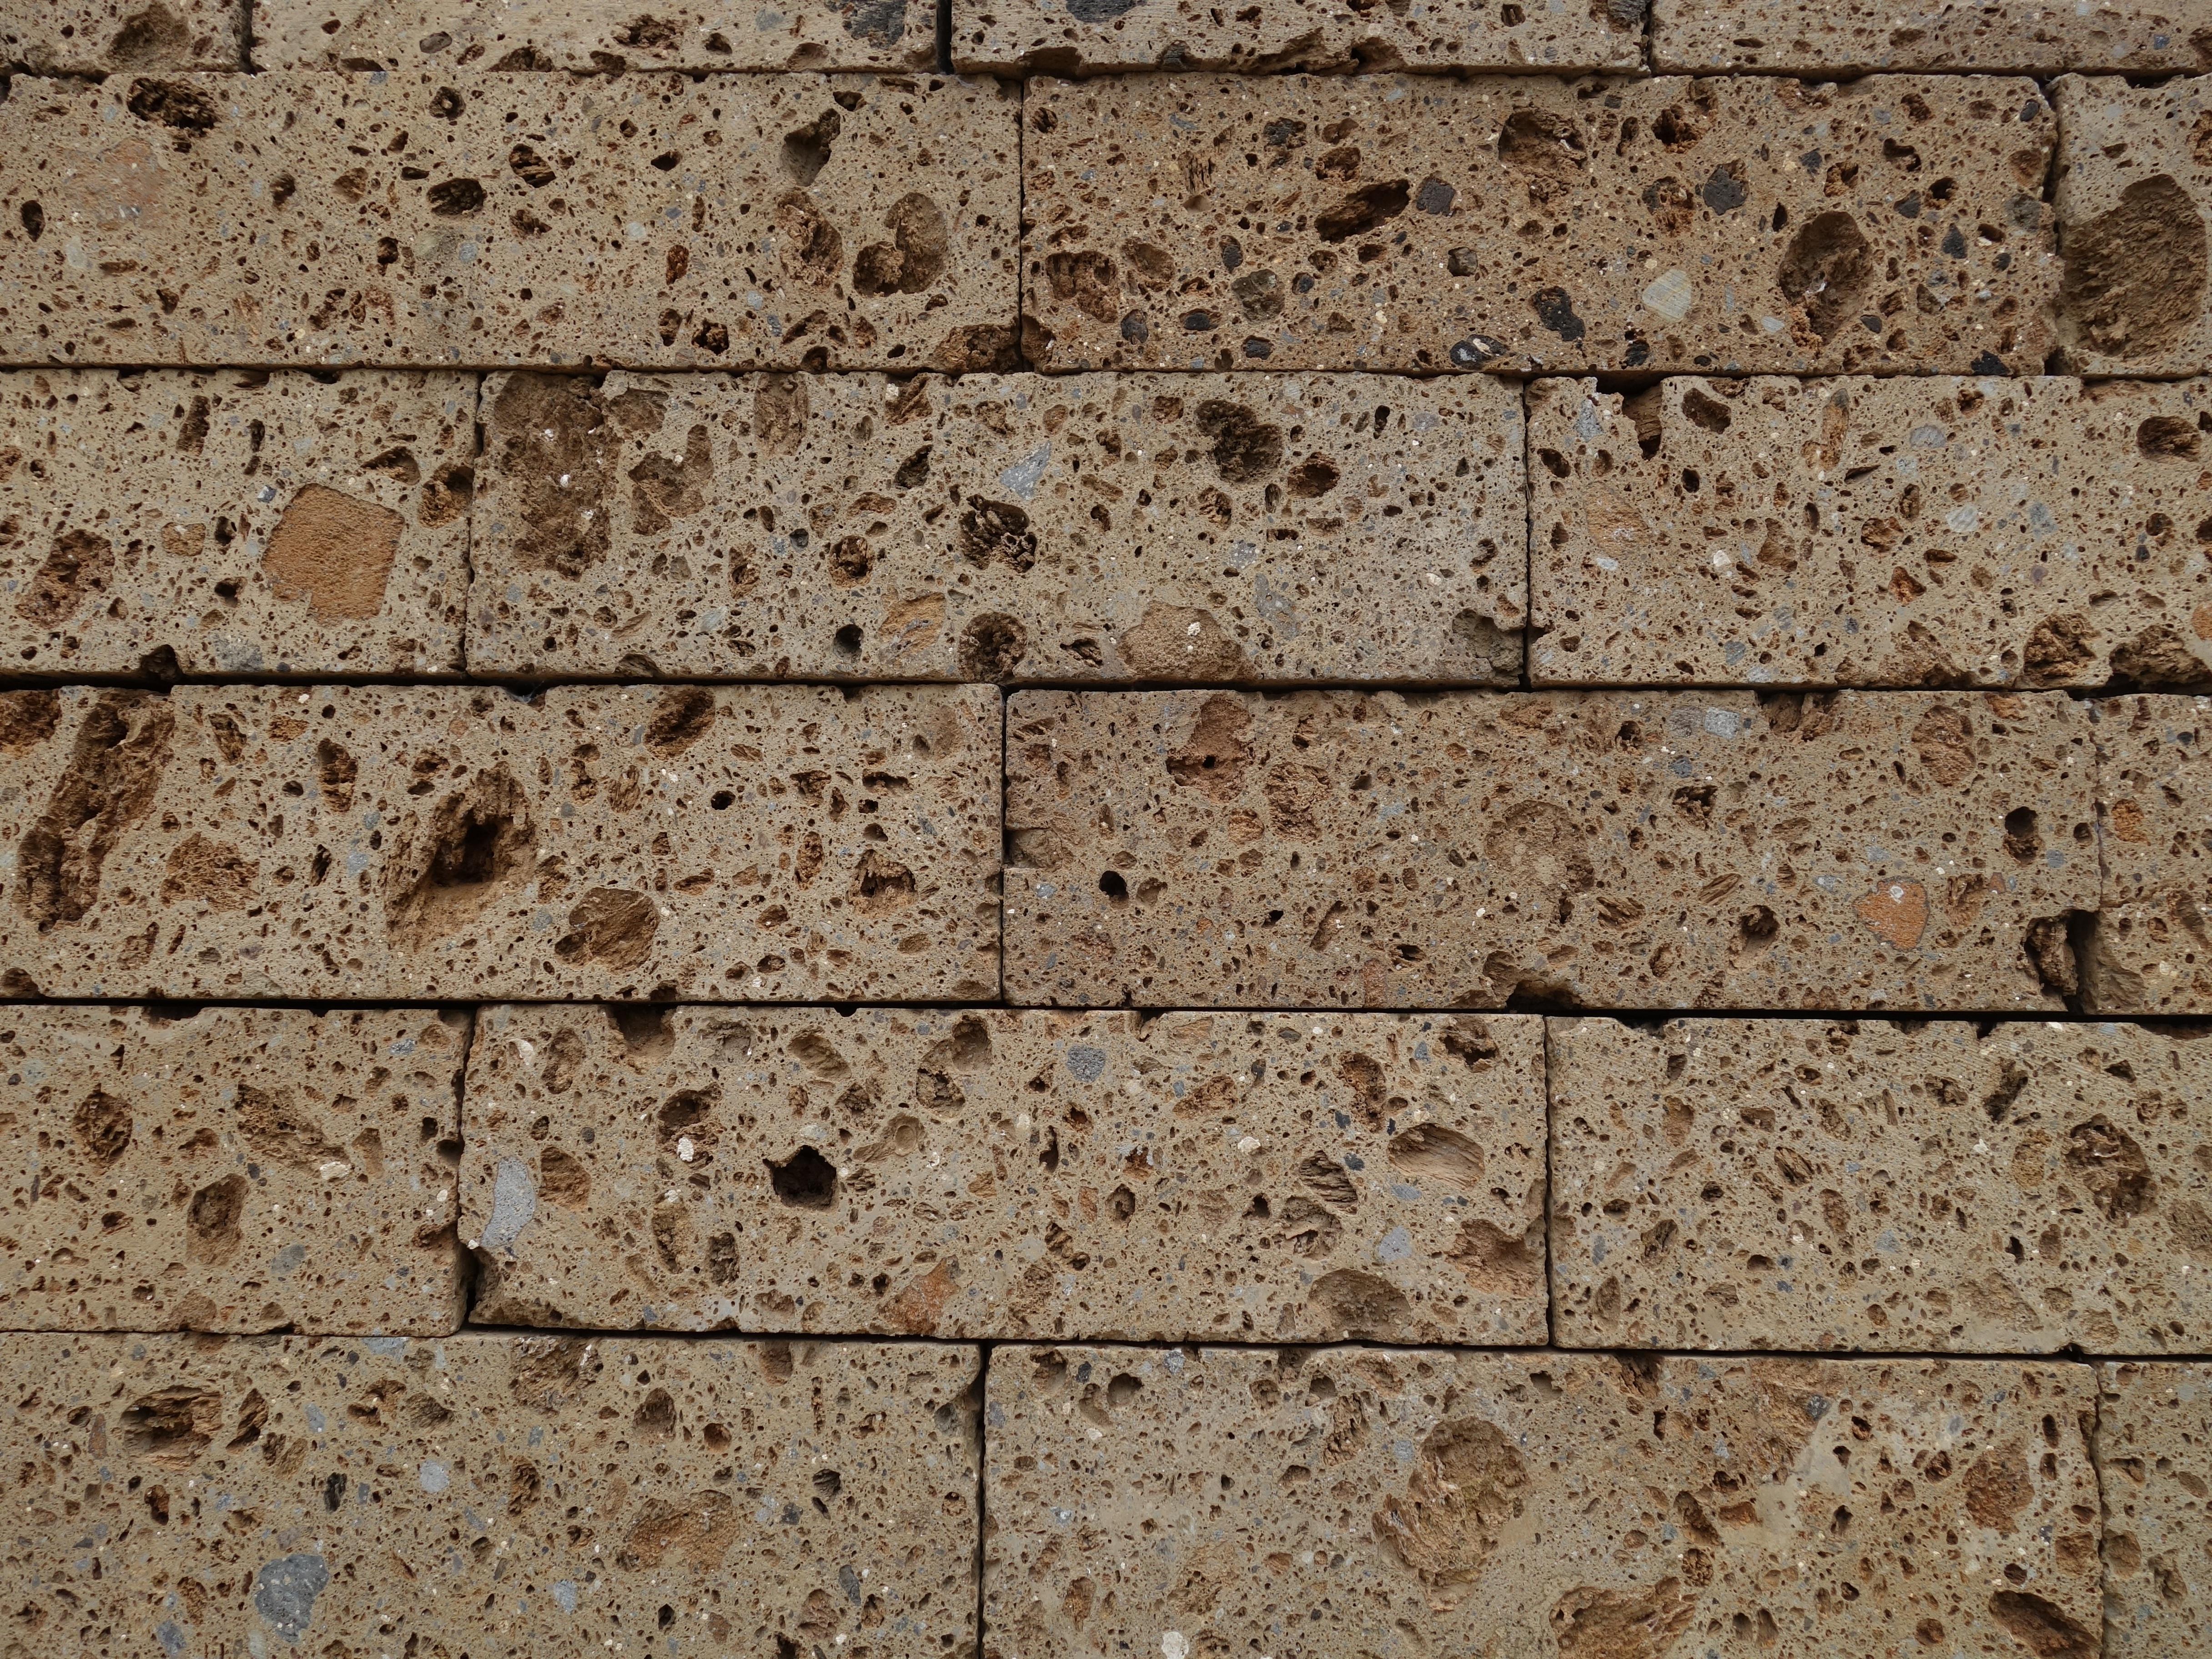 textura piso pared patrn suelo pared de piedra ladrillo material ladrillos albailera piso toba sin